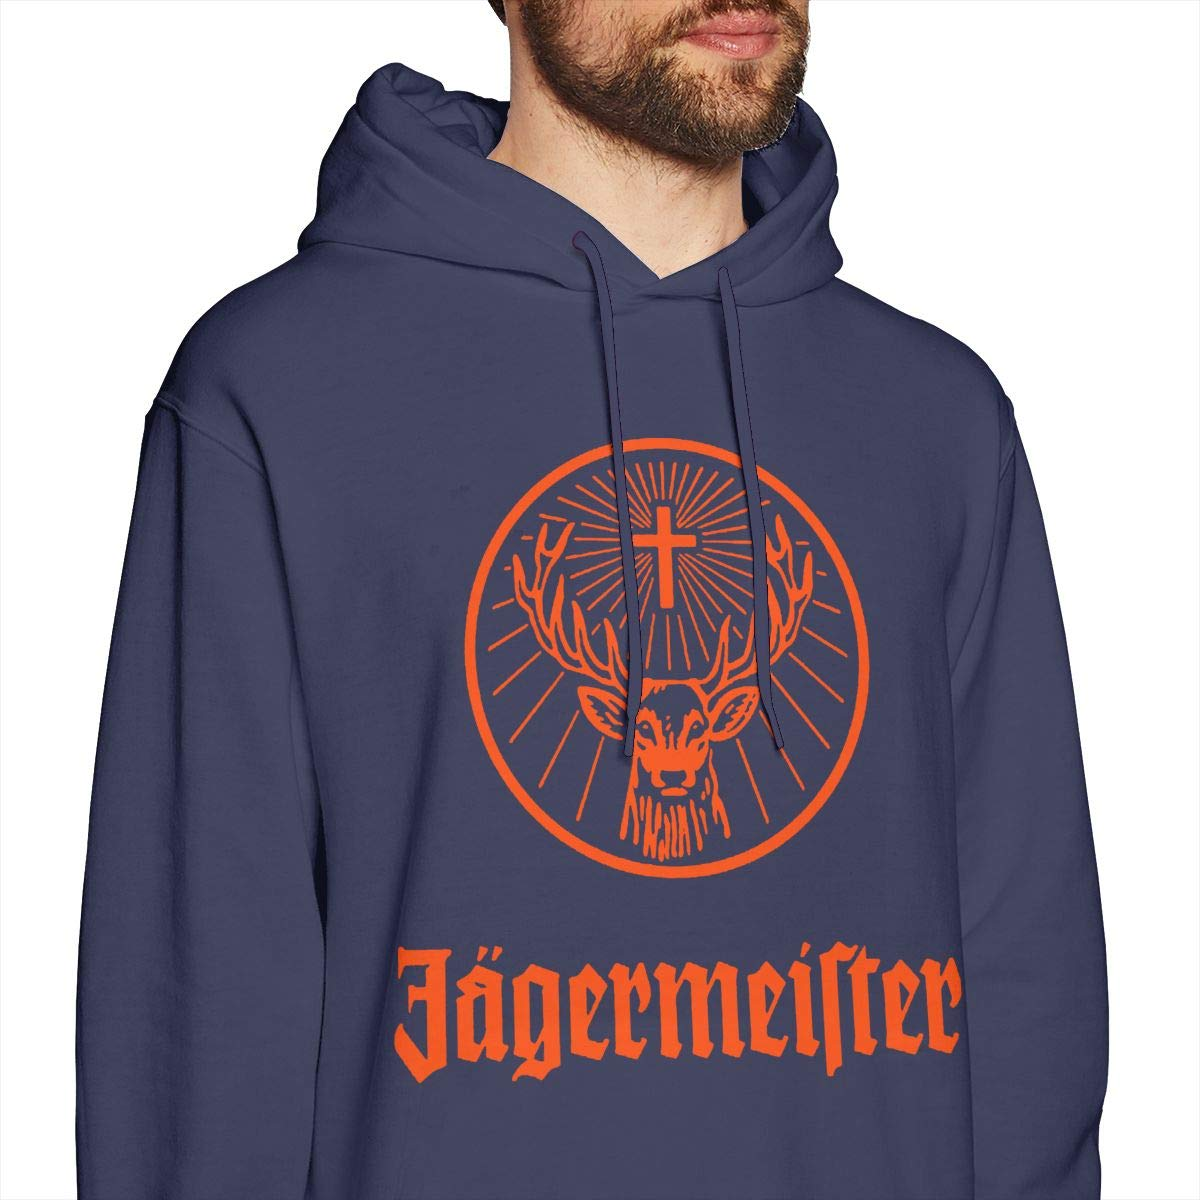 Rizhaoyue Mens Hooded Sweatshirt Jagermeister Logo Personality Street Trend Creation Navy